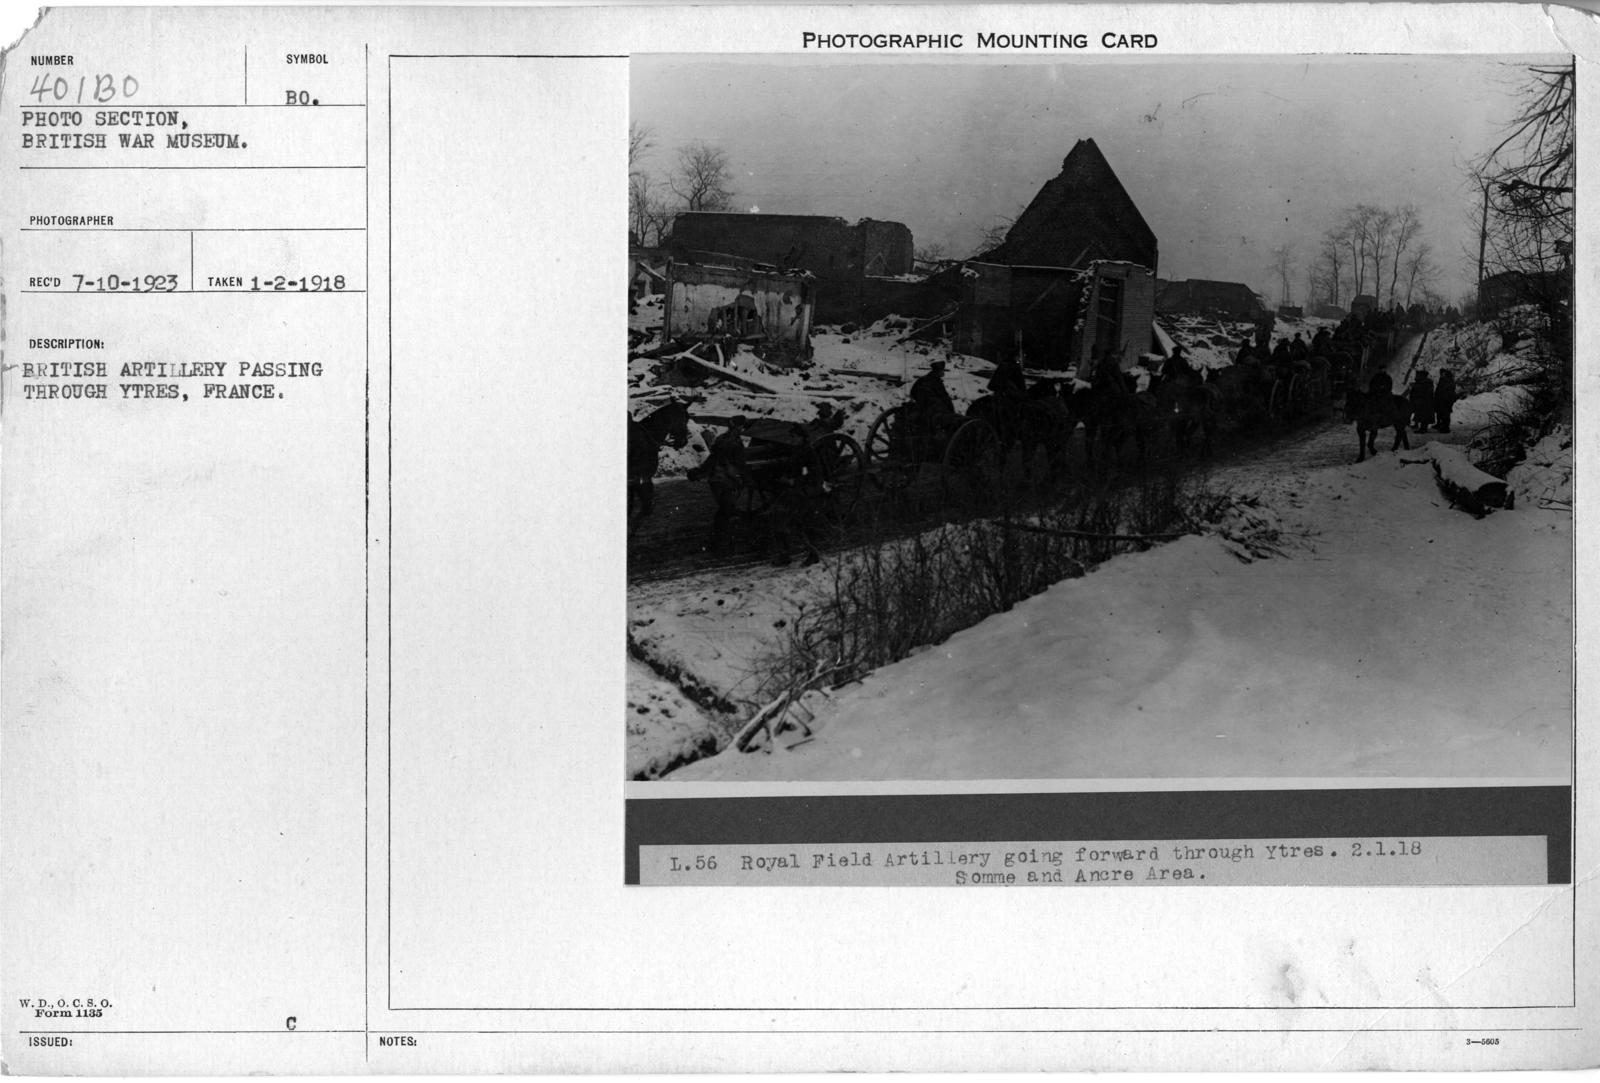 British Artillery passing through Ytres, France; 1/2/1918